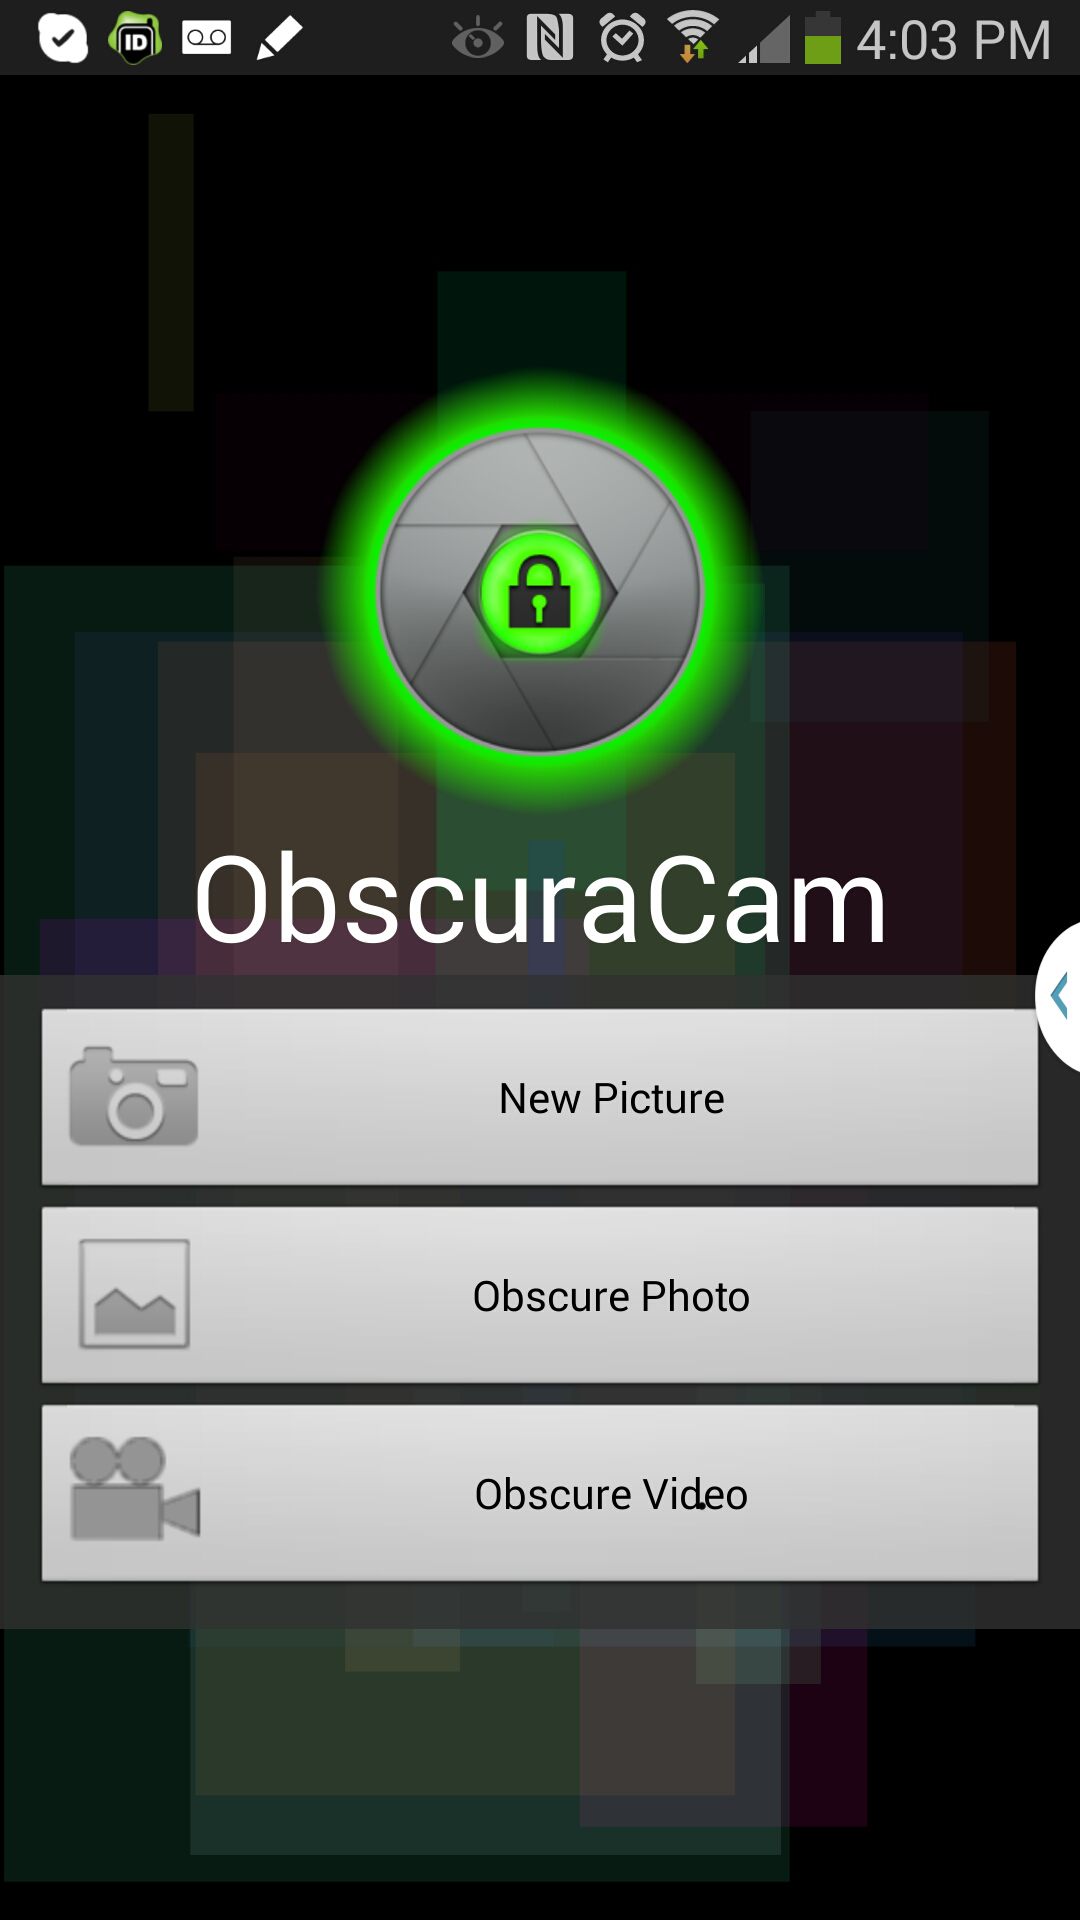 Hands-On: Using ObscuraCam